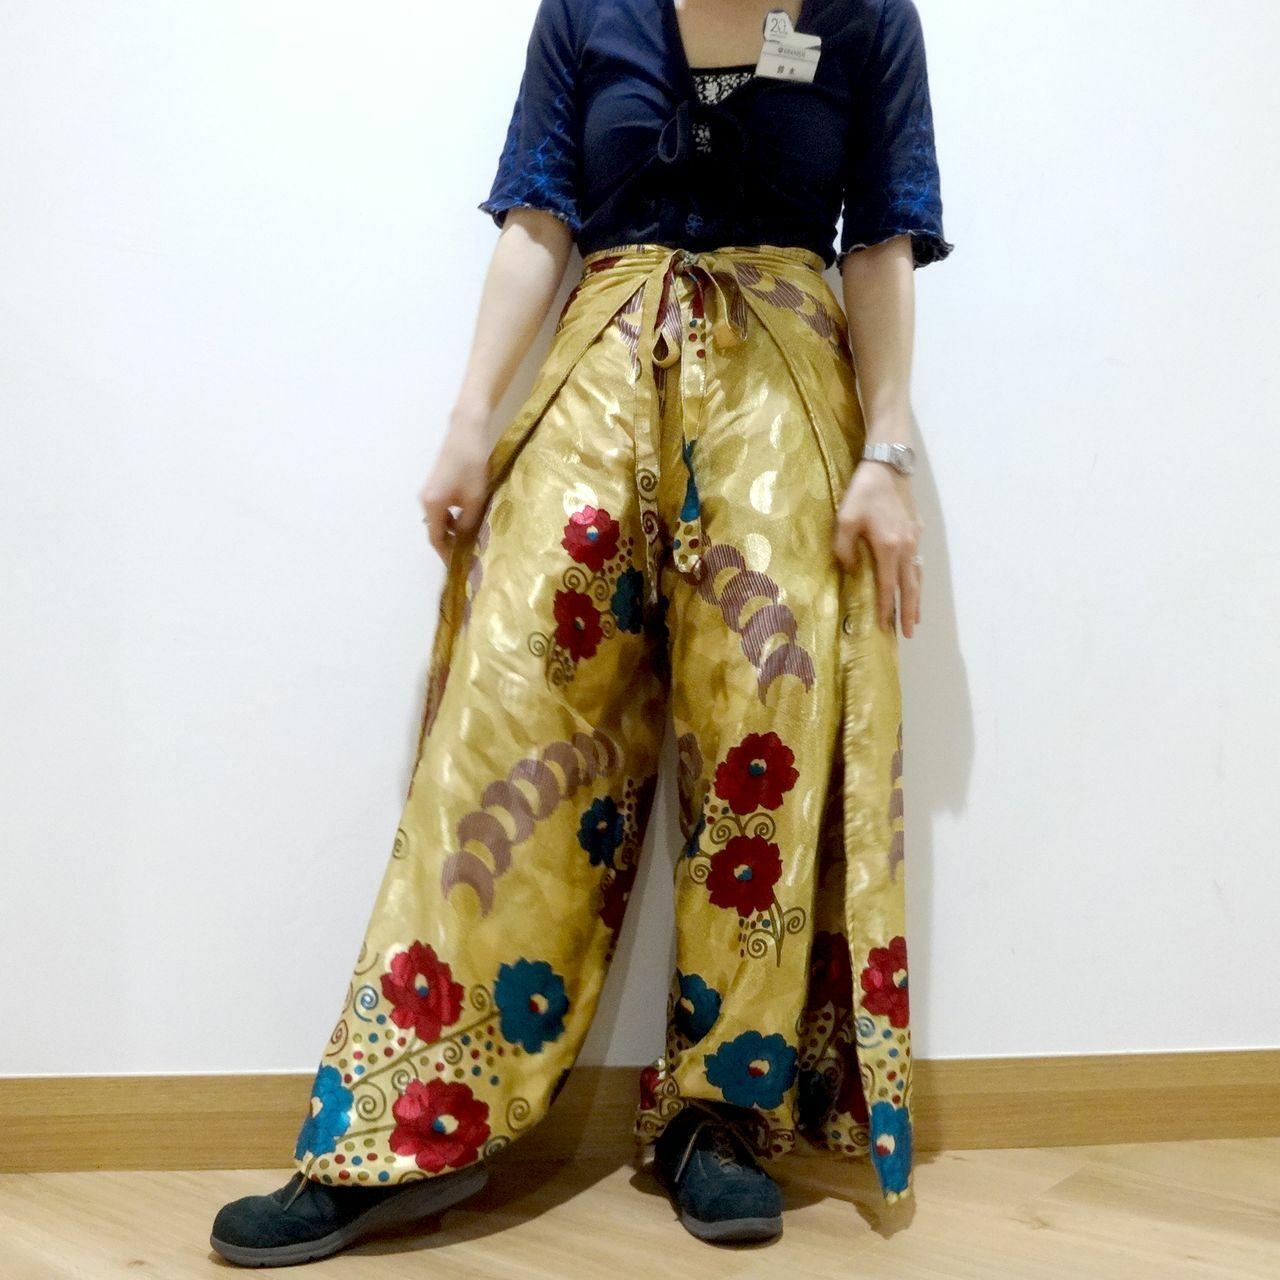 vdsn-035 ビンテージシルクサリーネパリパンツ「ローズ&ローズ」【訳あり】